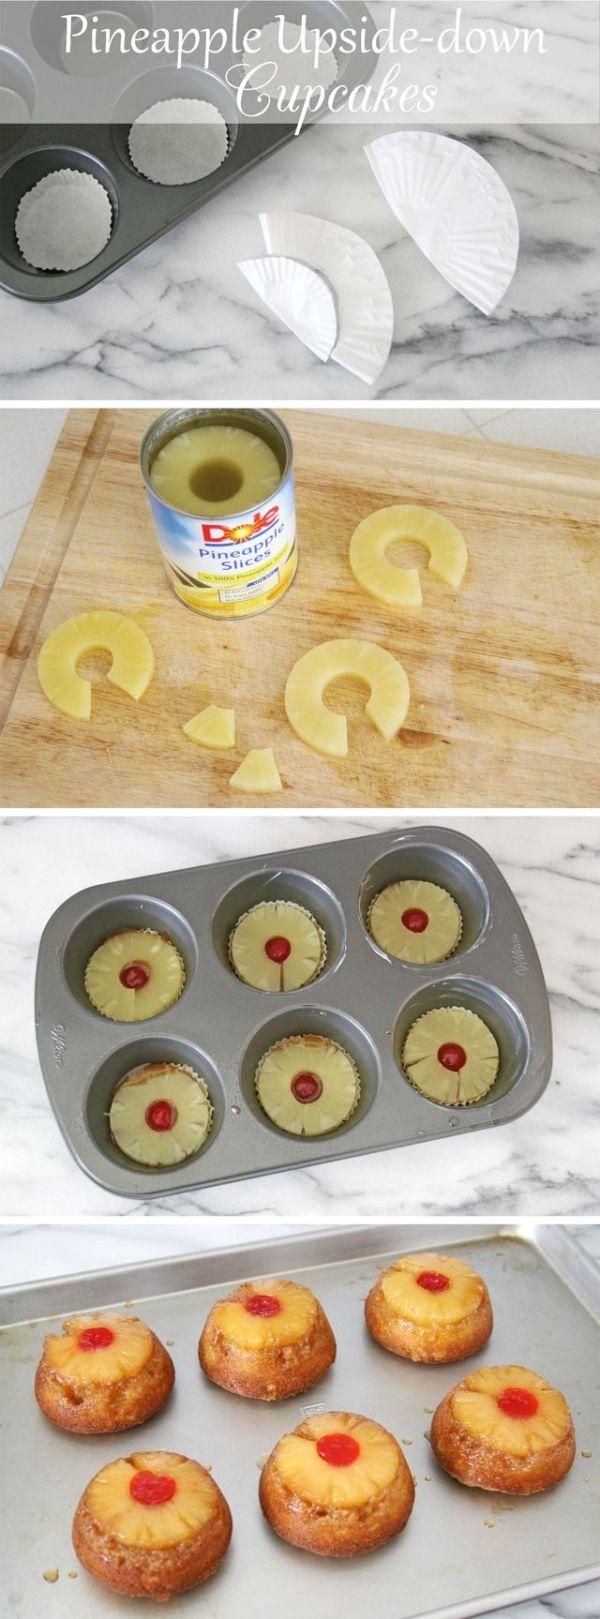 Pineapple Upside Down Cupcakes Meals Pineapple Upside